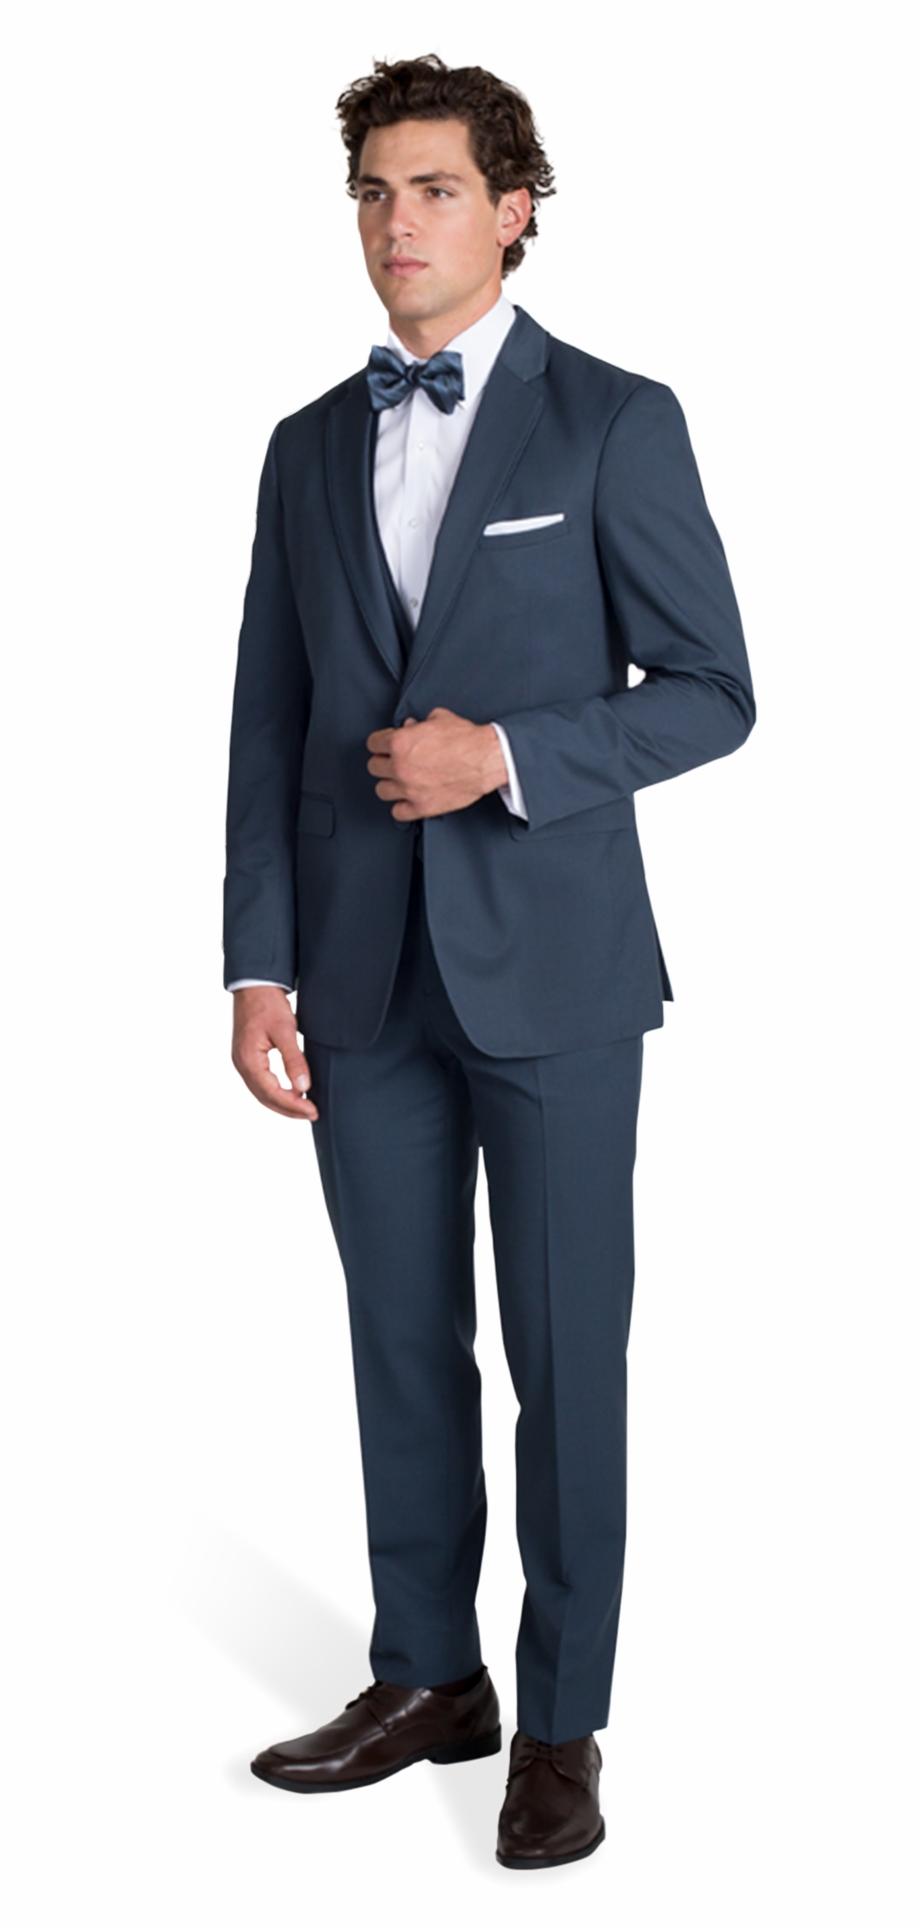 Slate Blue Suit By Allure Men.